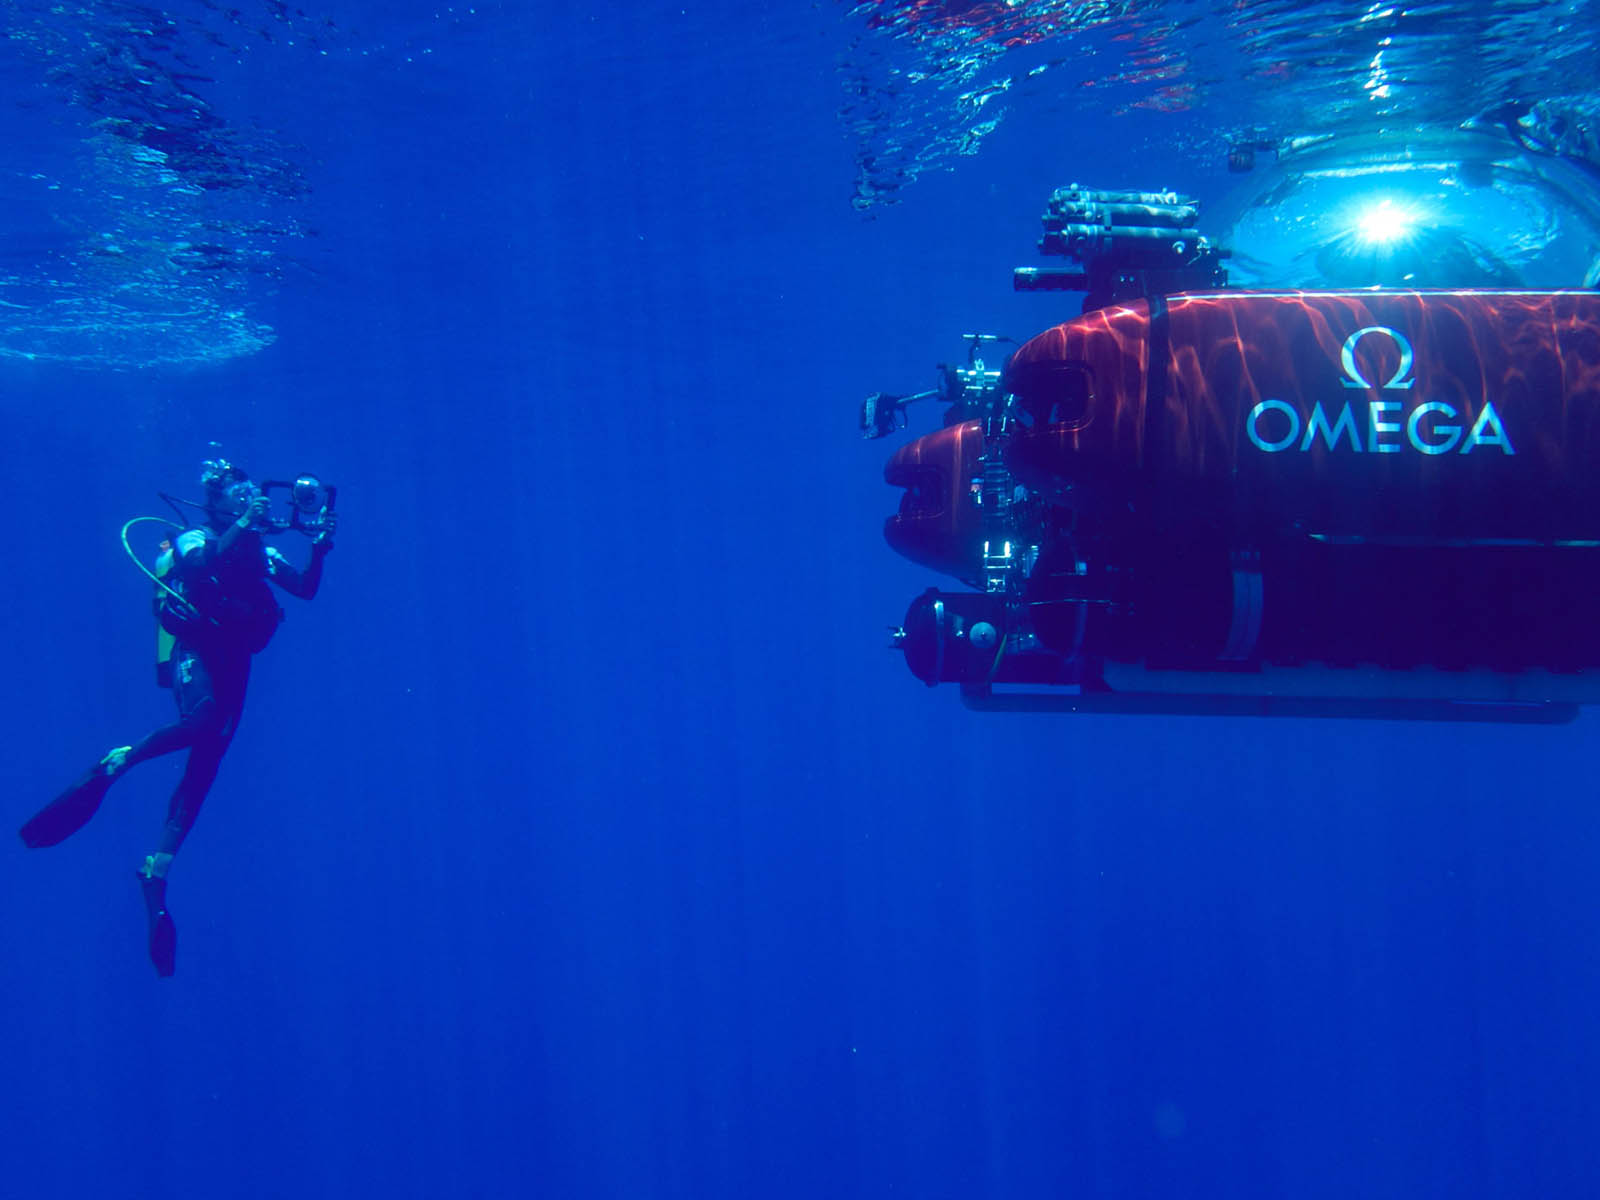 omega-seamaster-diver-300m-nekton-edition-4.jpg